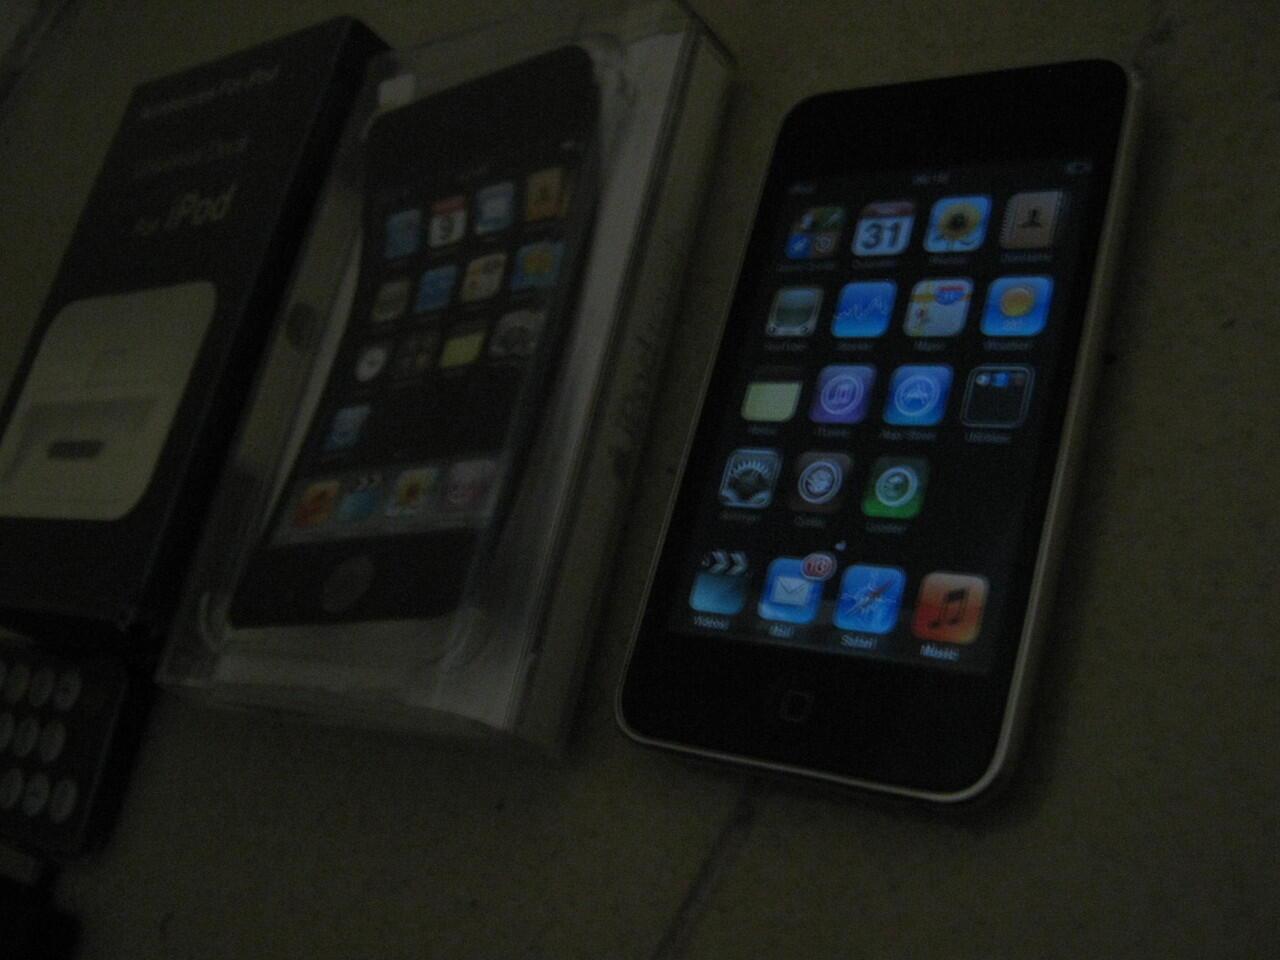 BANTAI iPod 2nd Gen udah murah fullset lagi